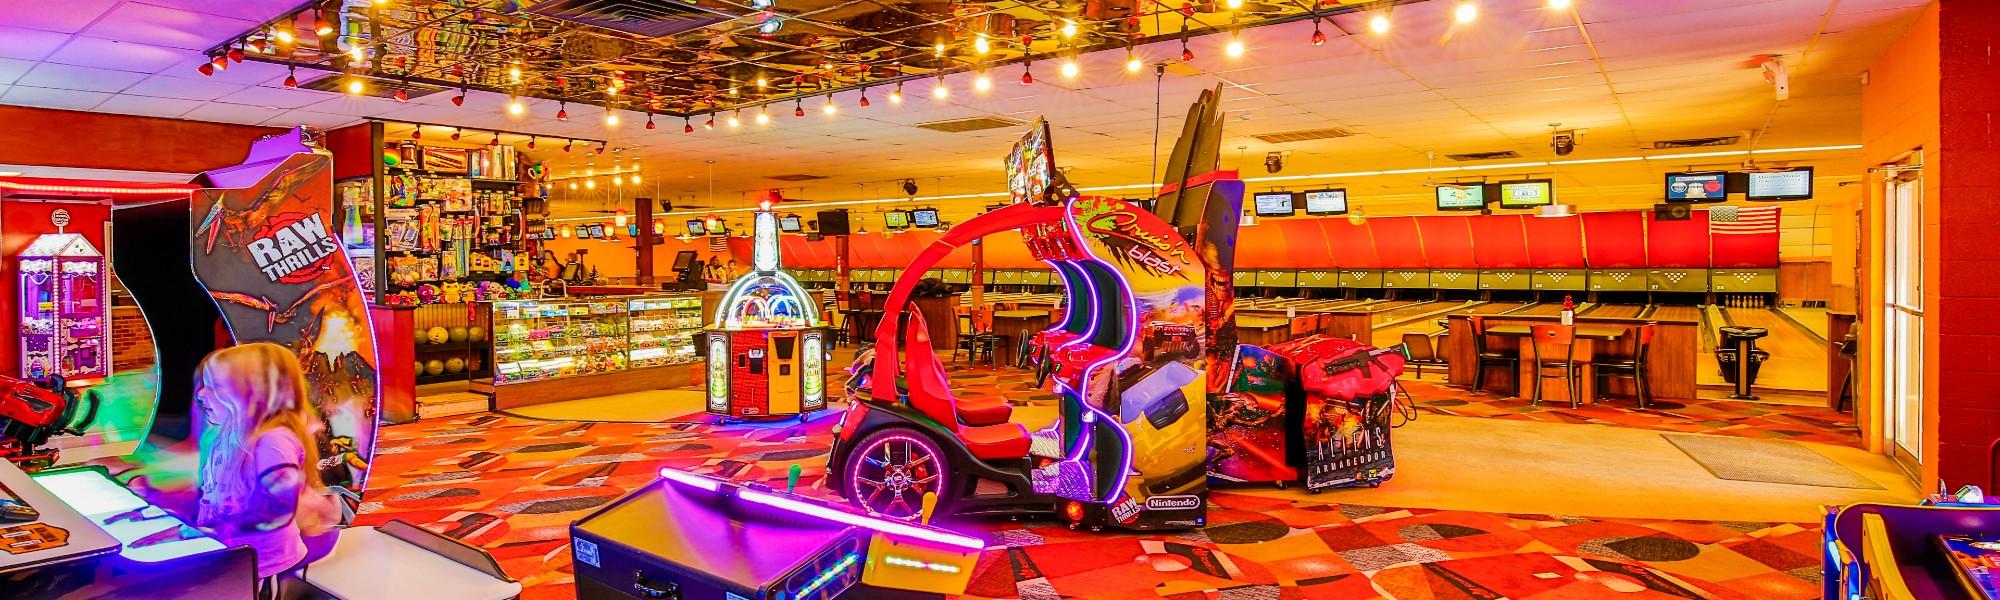 Rose Bowl Arcade